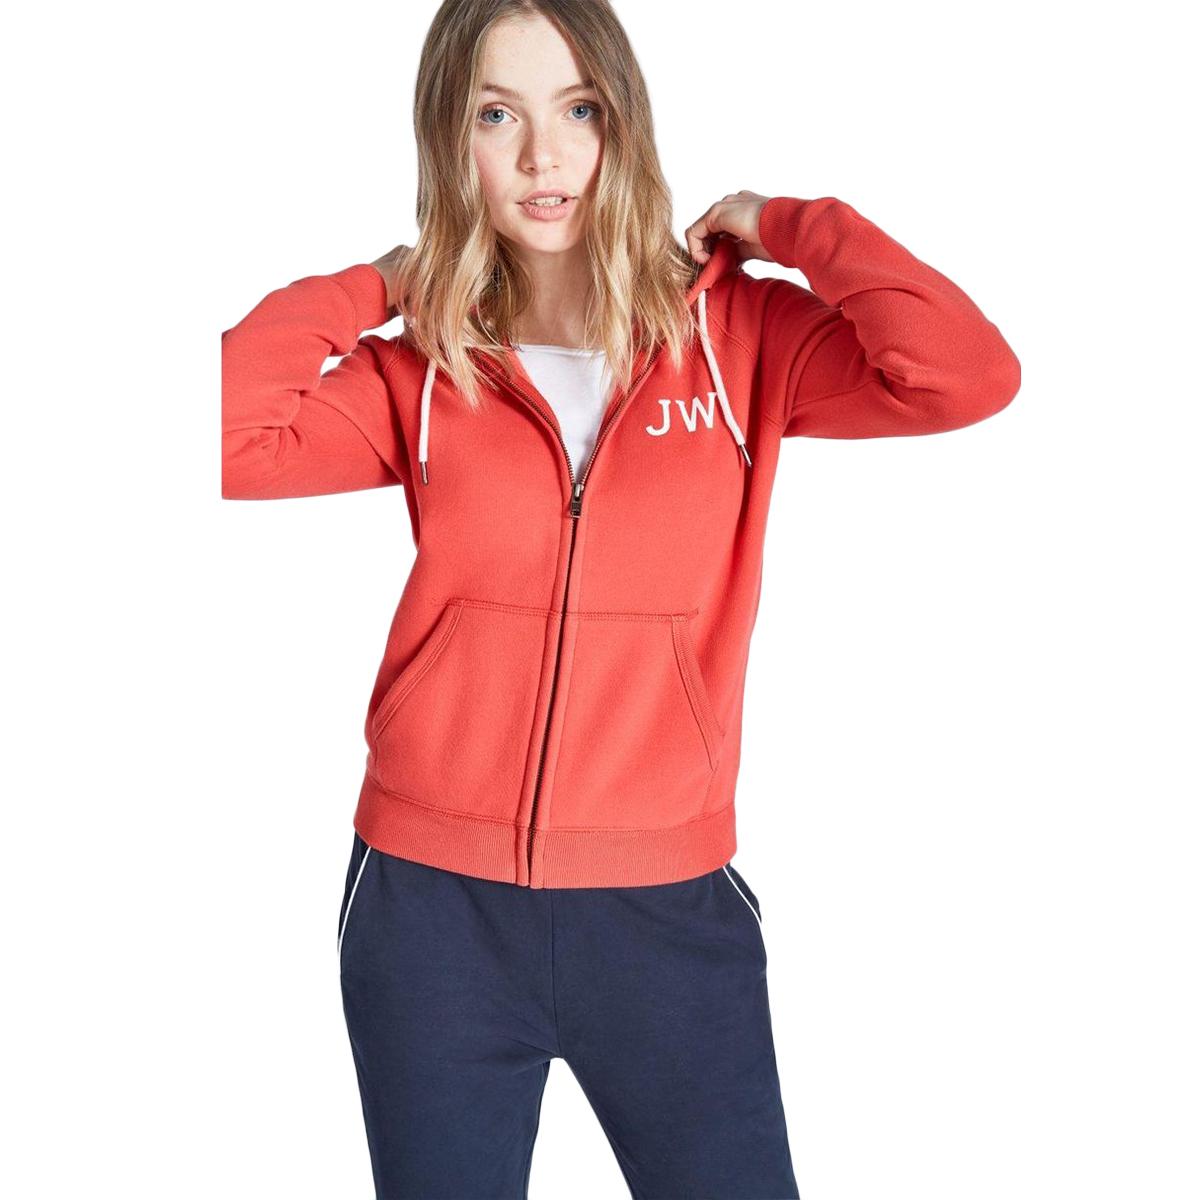 Jack Wills Women's Raynes Zip-Through Hoodie - Red, 6